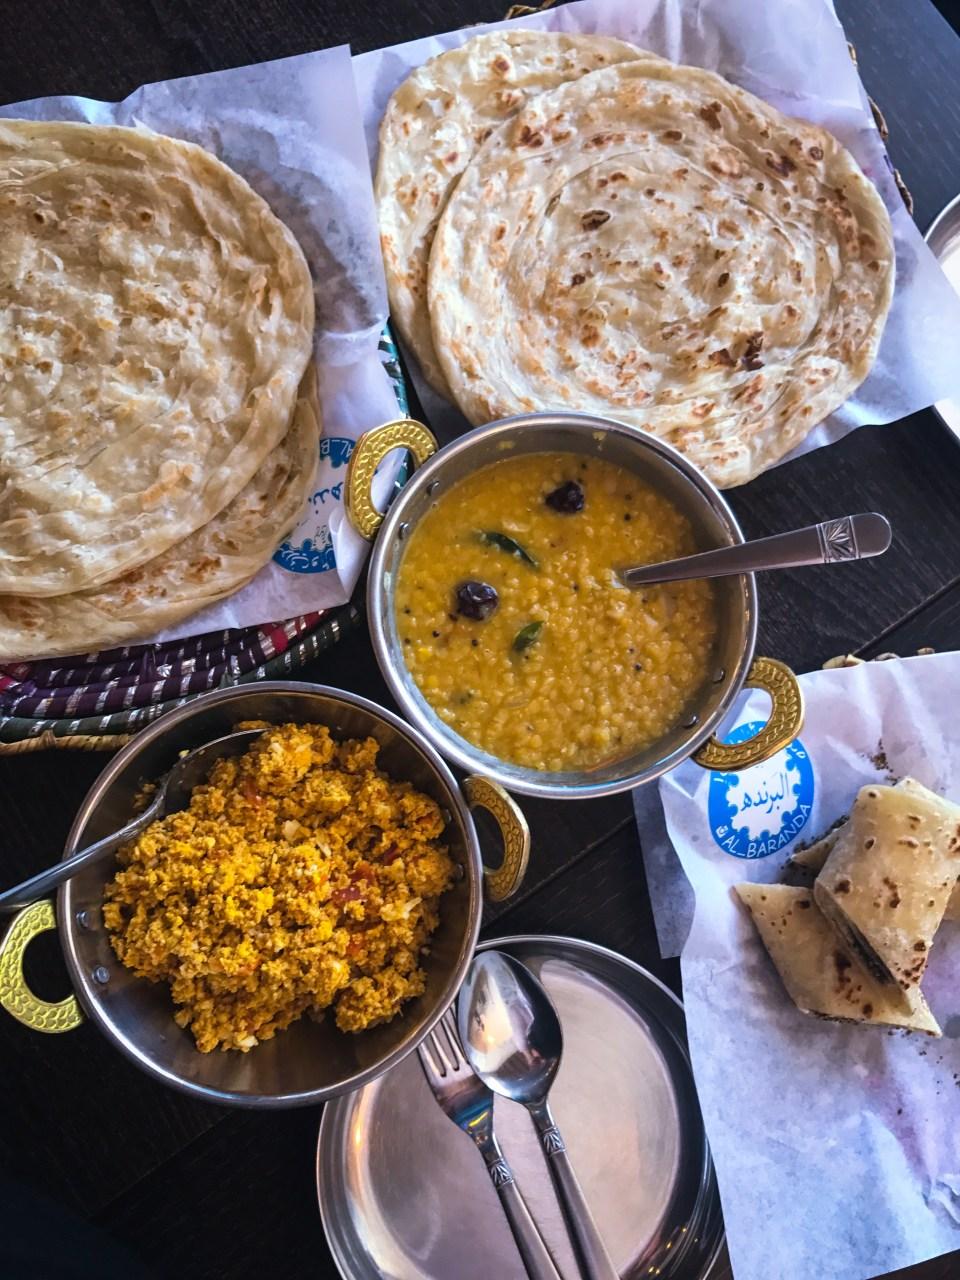 Qatari food at Al Baranda